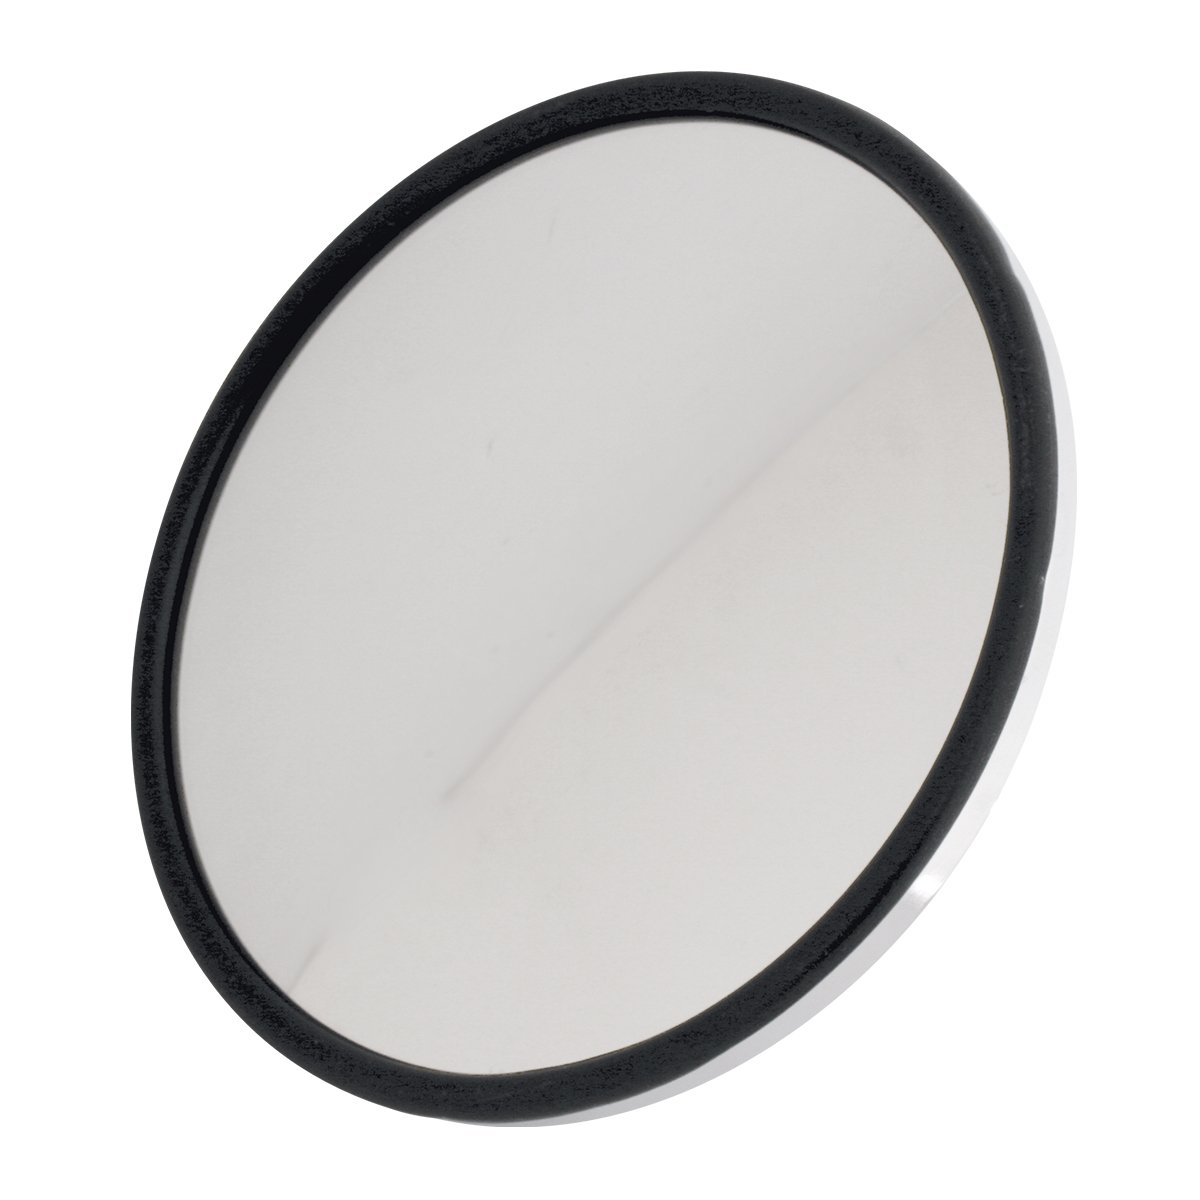 Grand General 33081 Stainless Steel 8 Convex Blind Spot Mirror withL Bracket